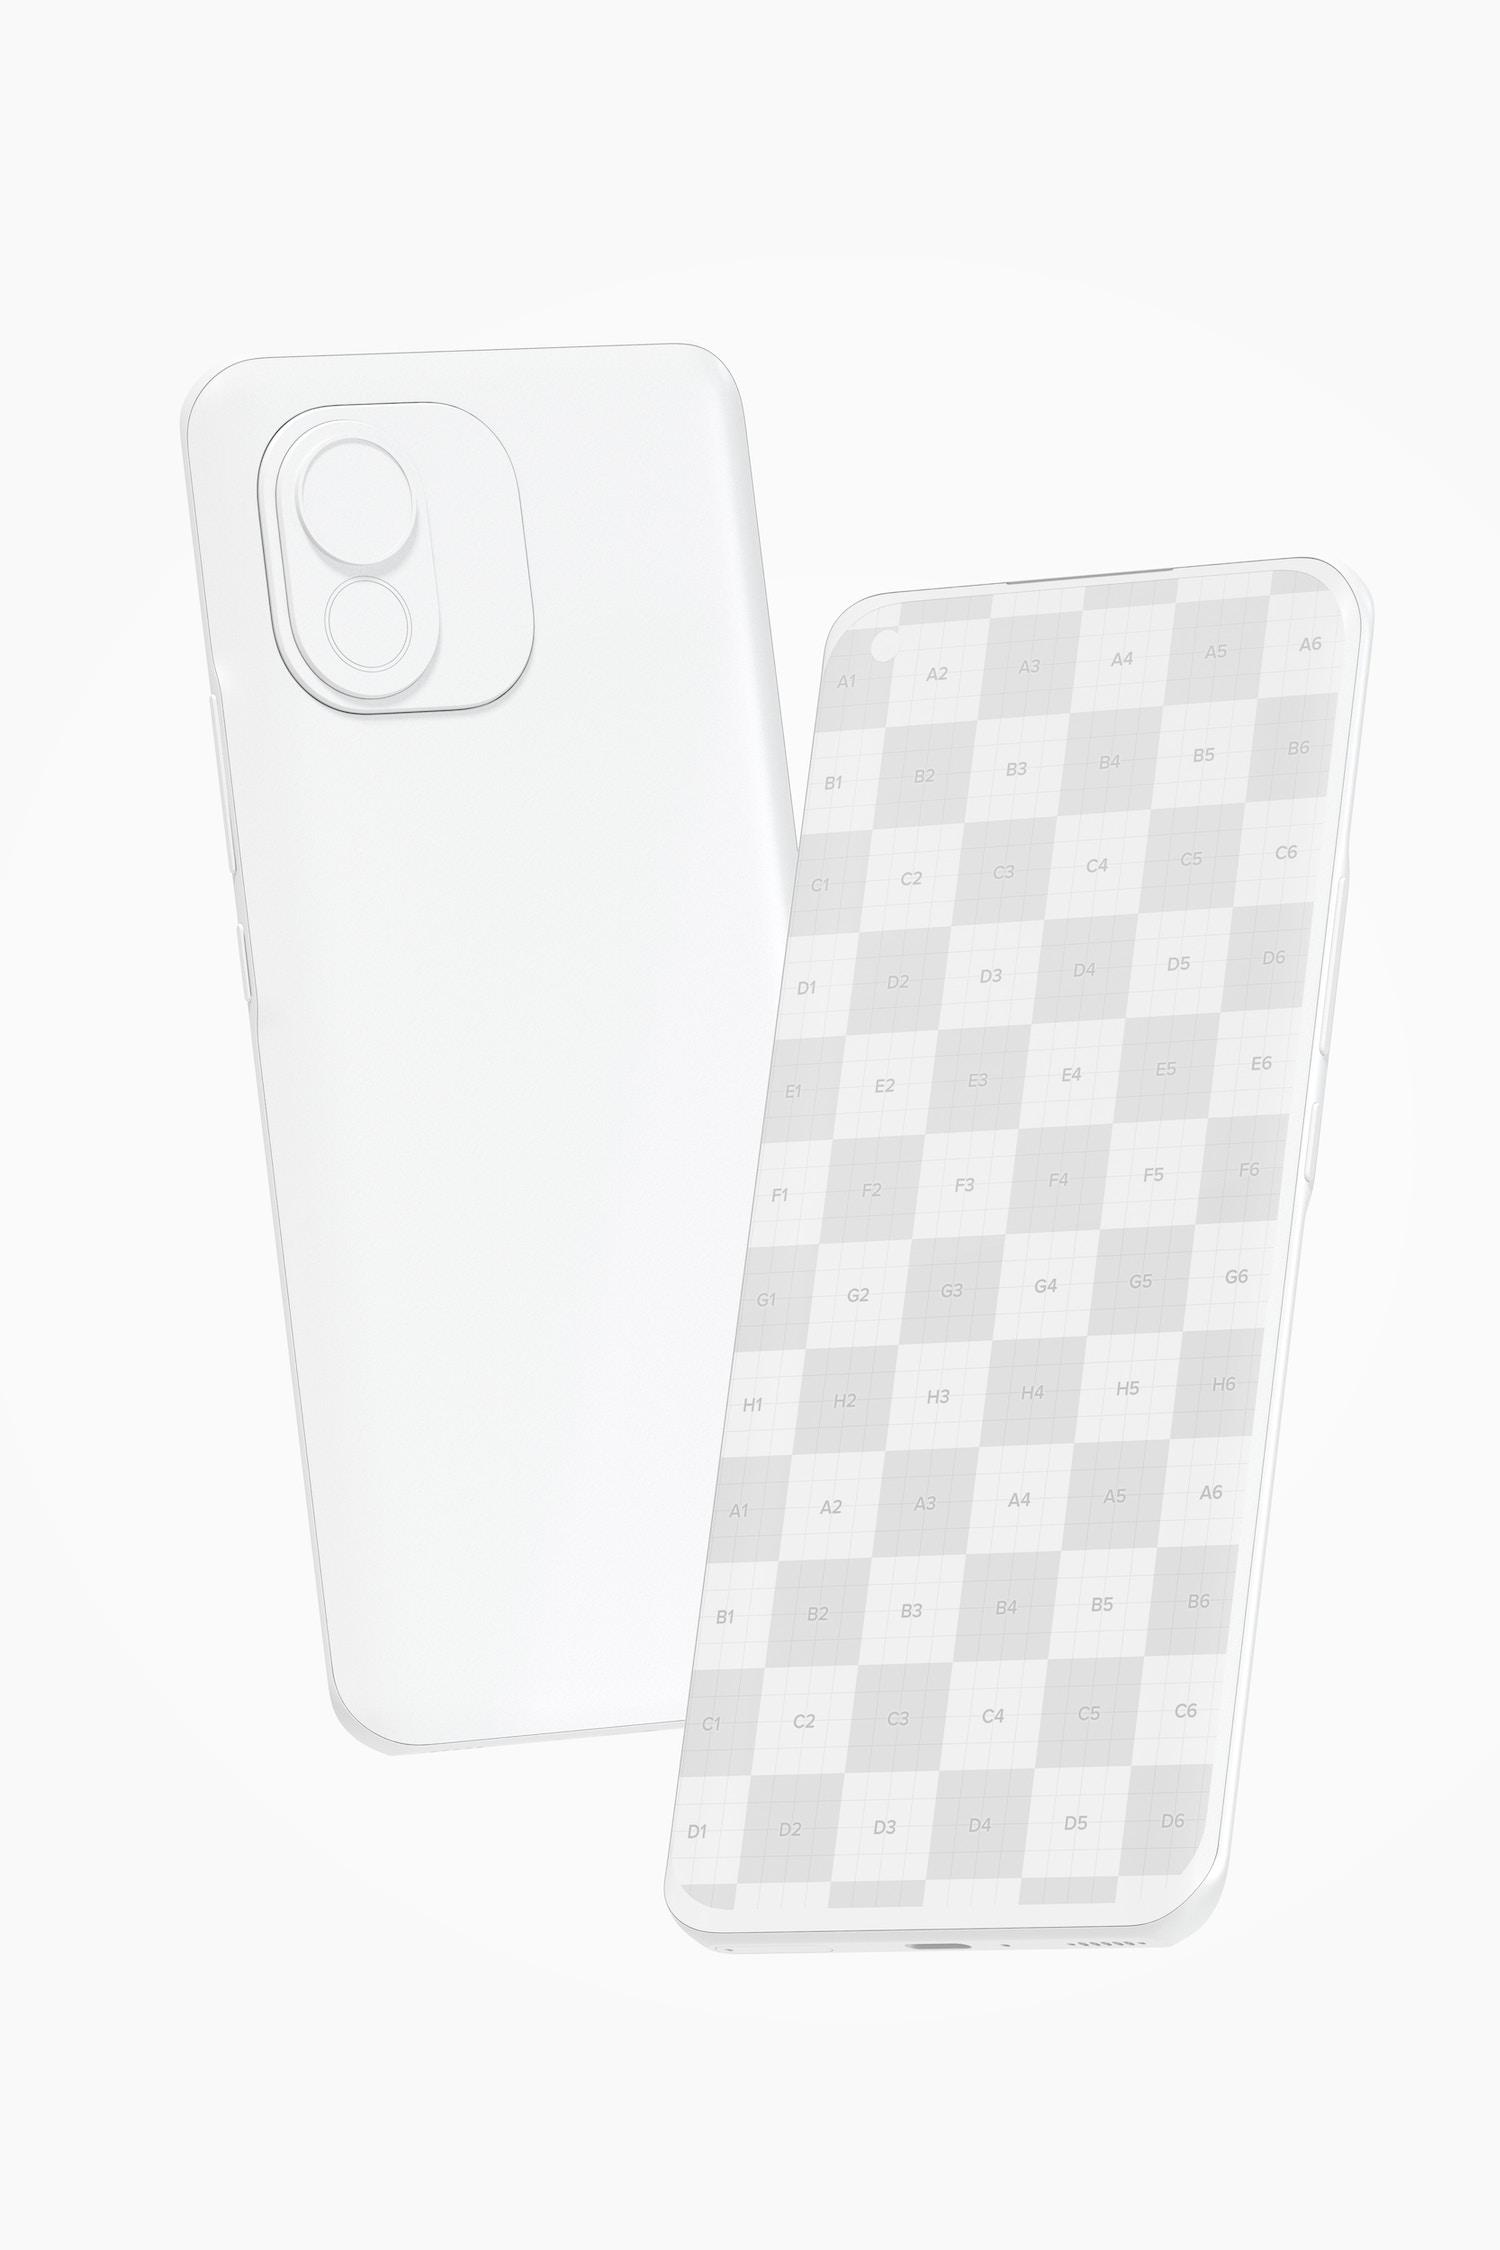 Clay Xiaomi Smartphones Mockup, Floating